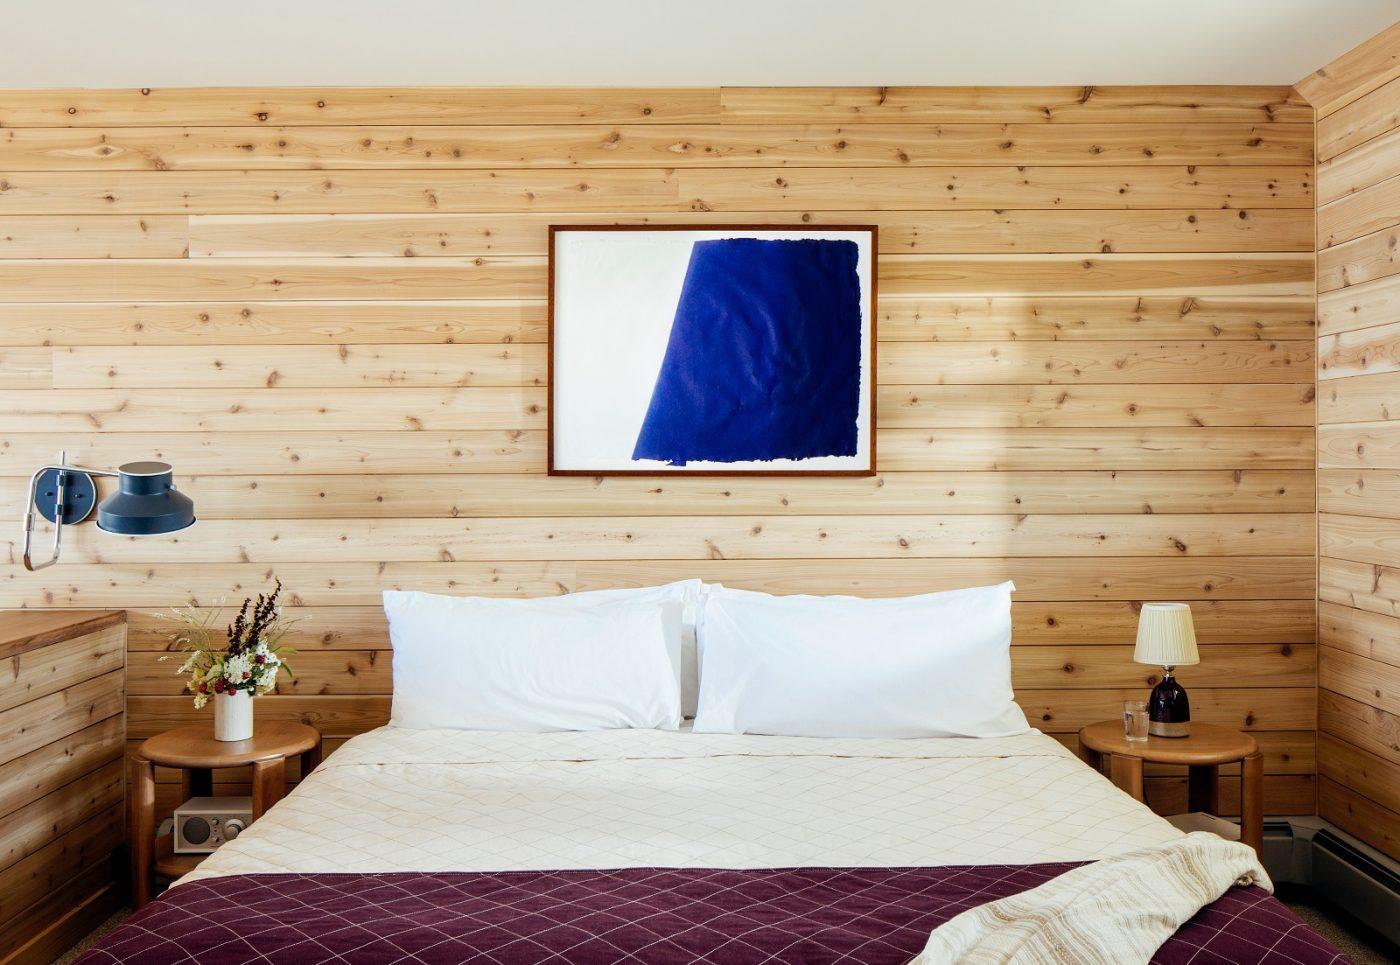 Bed in guest room